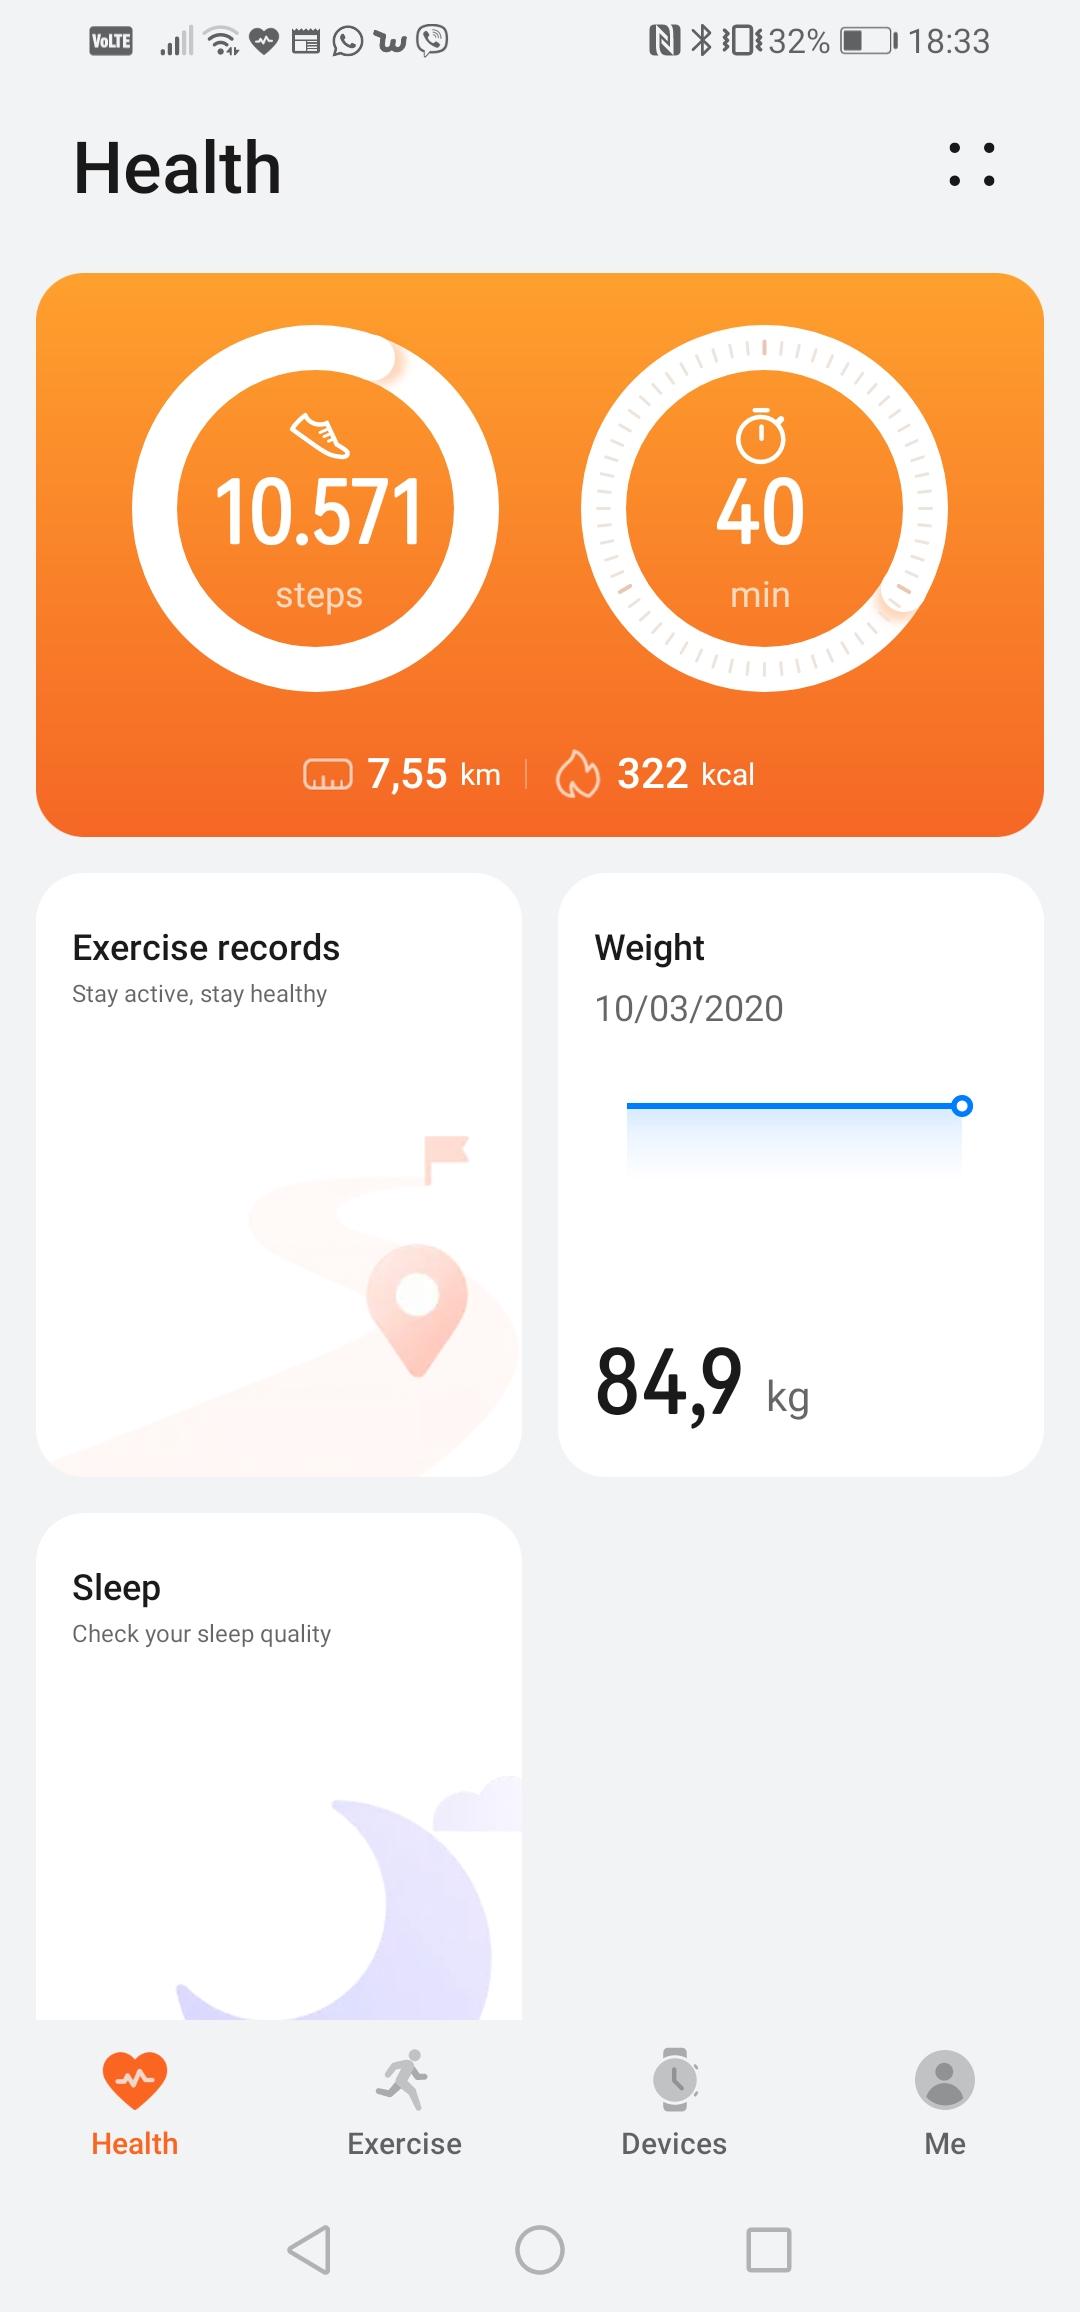 screenshot_20210520_183316_com-huawei-health